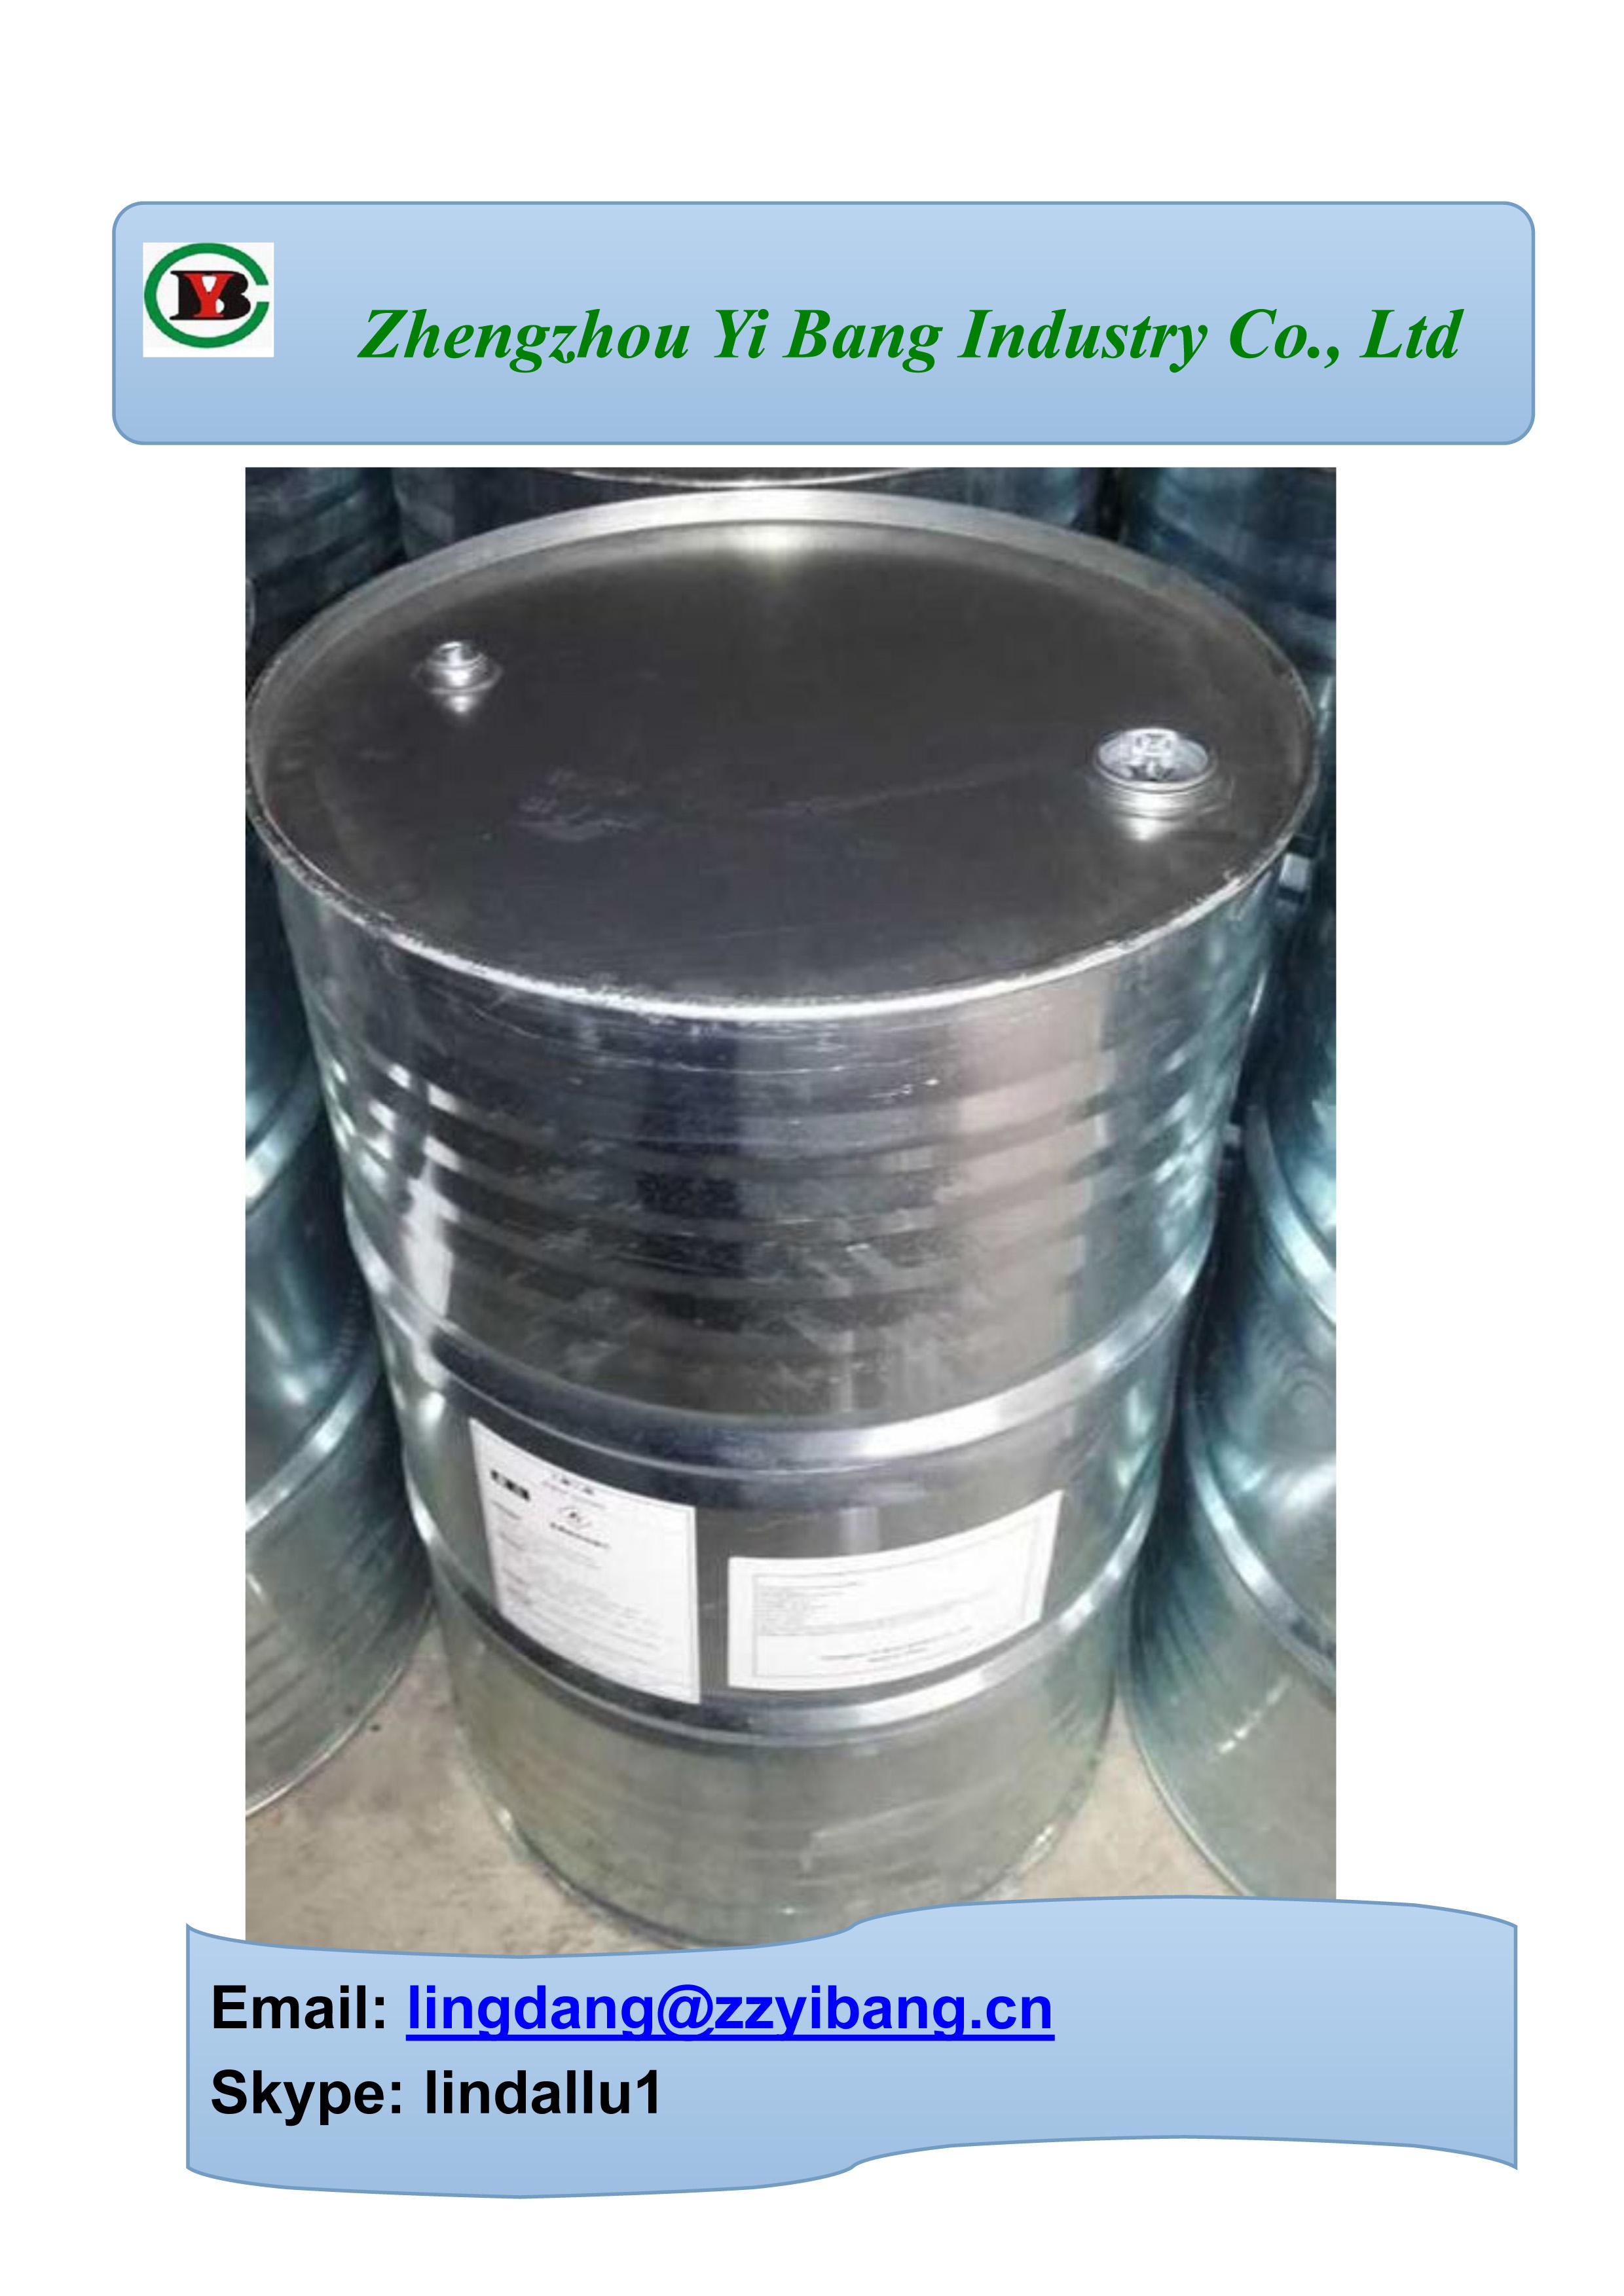 Factory price Hexanoic acid 99%min CAS:142-62-1